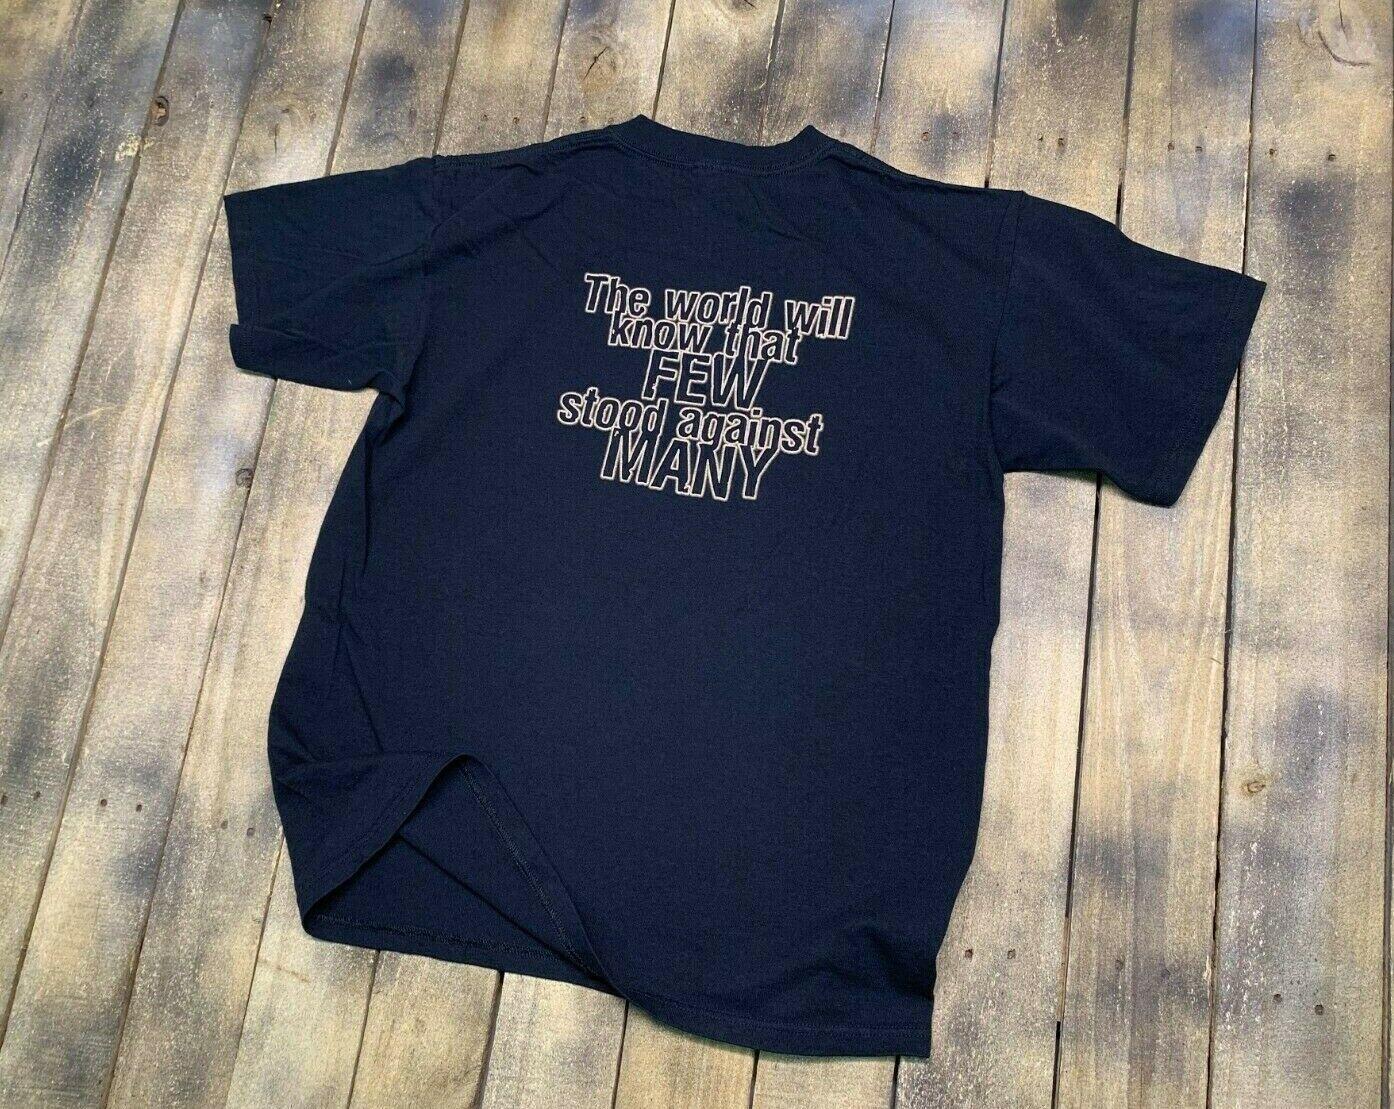 L * never worn 300 movie t shirt * vtg frank mill… - image 3